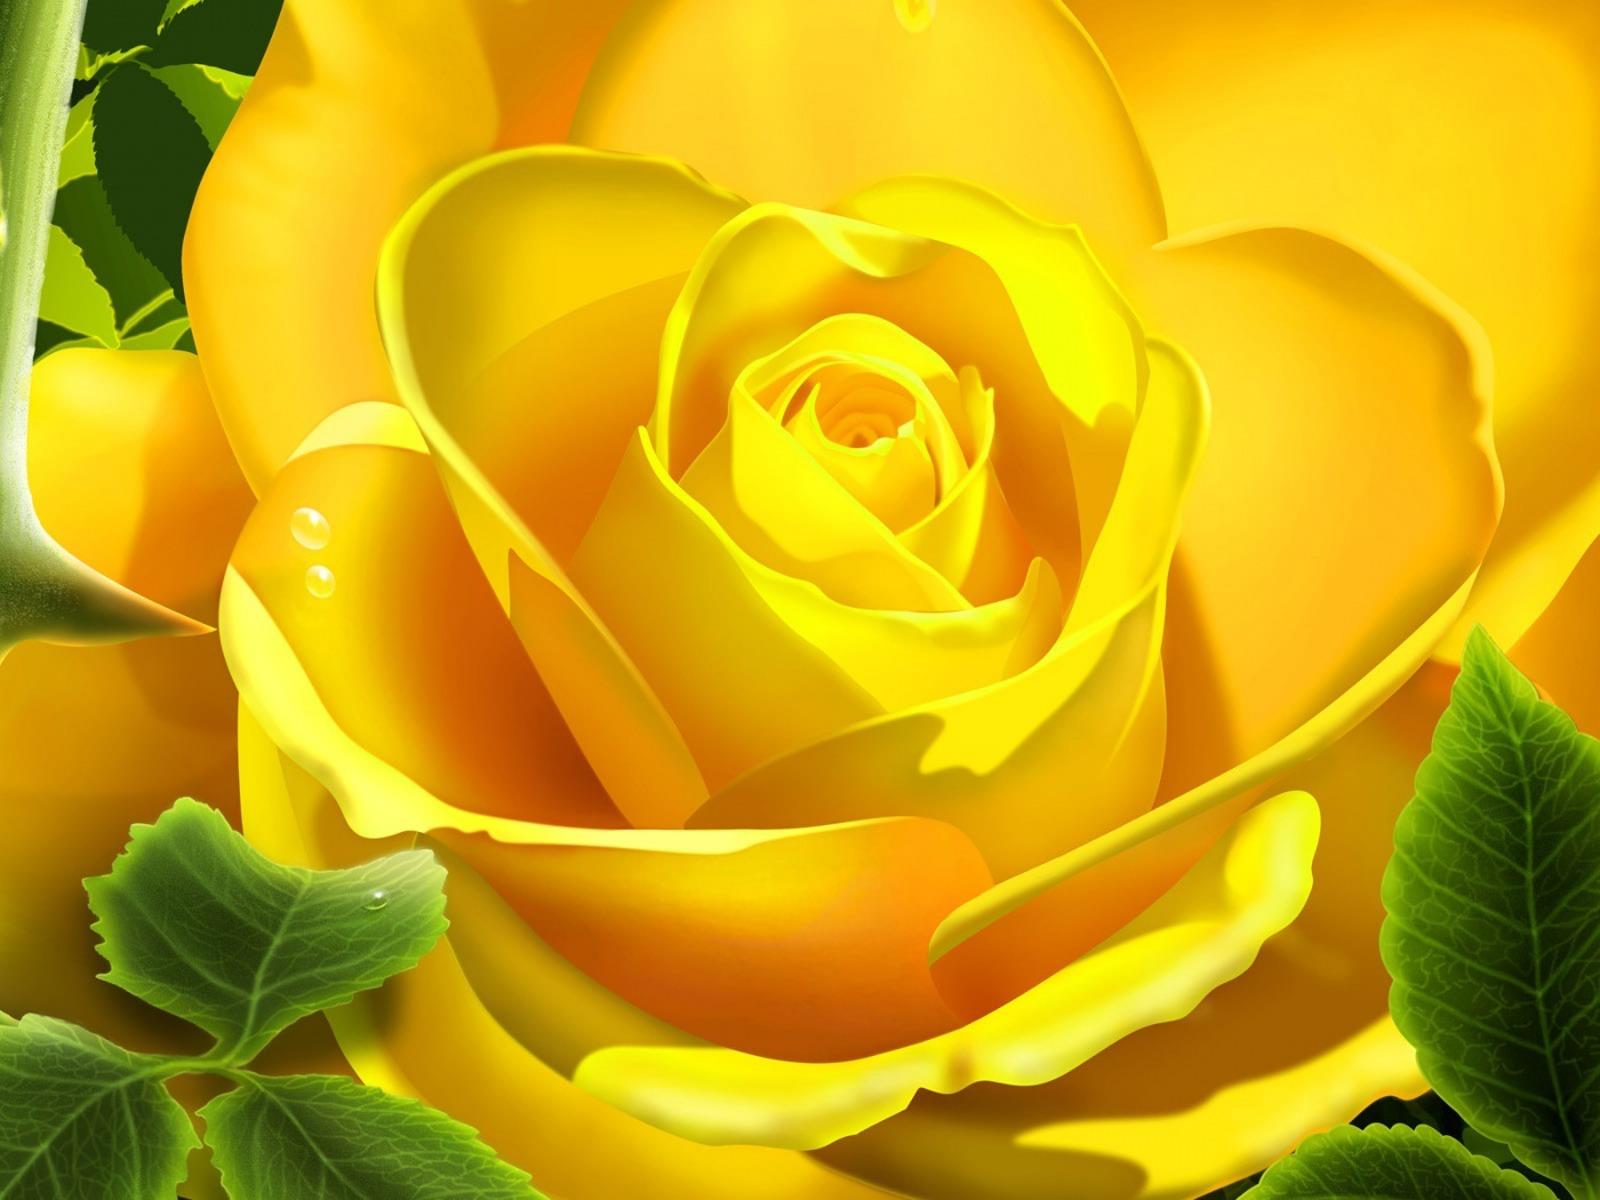 http://4.bp.blogspot.com/-69-EuIgieEY/T05SecEPobI/AAAAAAAAD08/AOMc96wgNwI/s1600/The-best-top-desktop-yellow-wallpapers-yellow-wallpaper-yellow-background-hd-3.jpg